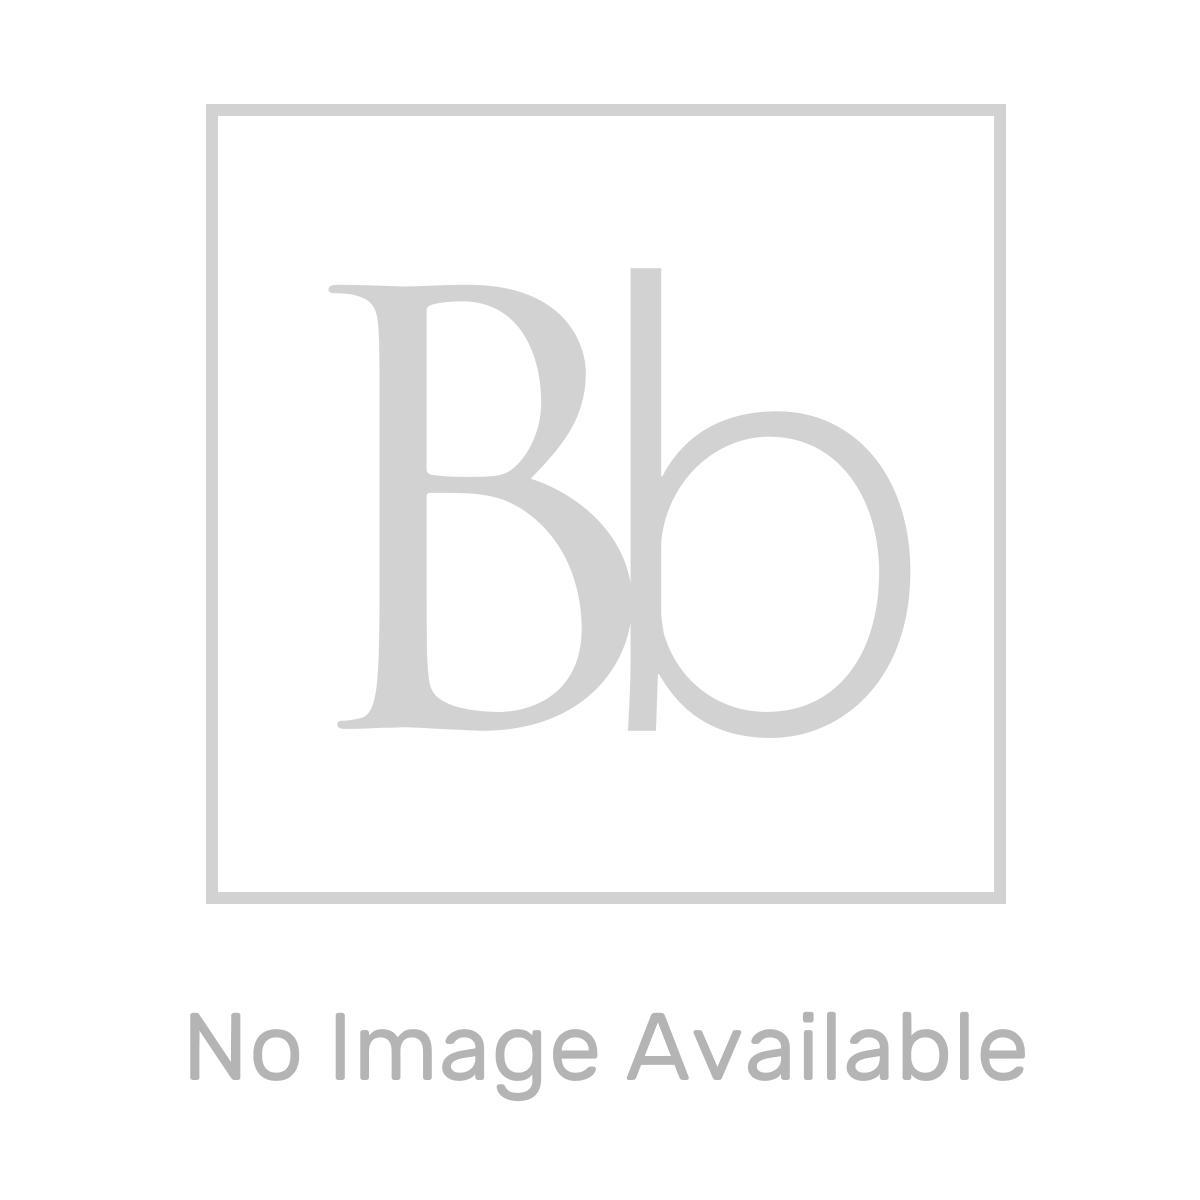 Nuie Blocks Satin Blue 2 Door/1 Drawer Floor Standing Vanity Unit with 50mm Profile Basin 600mm